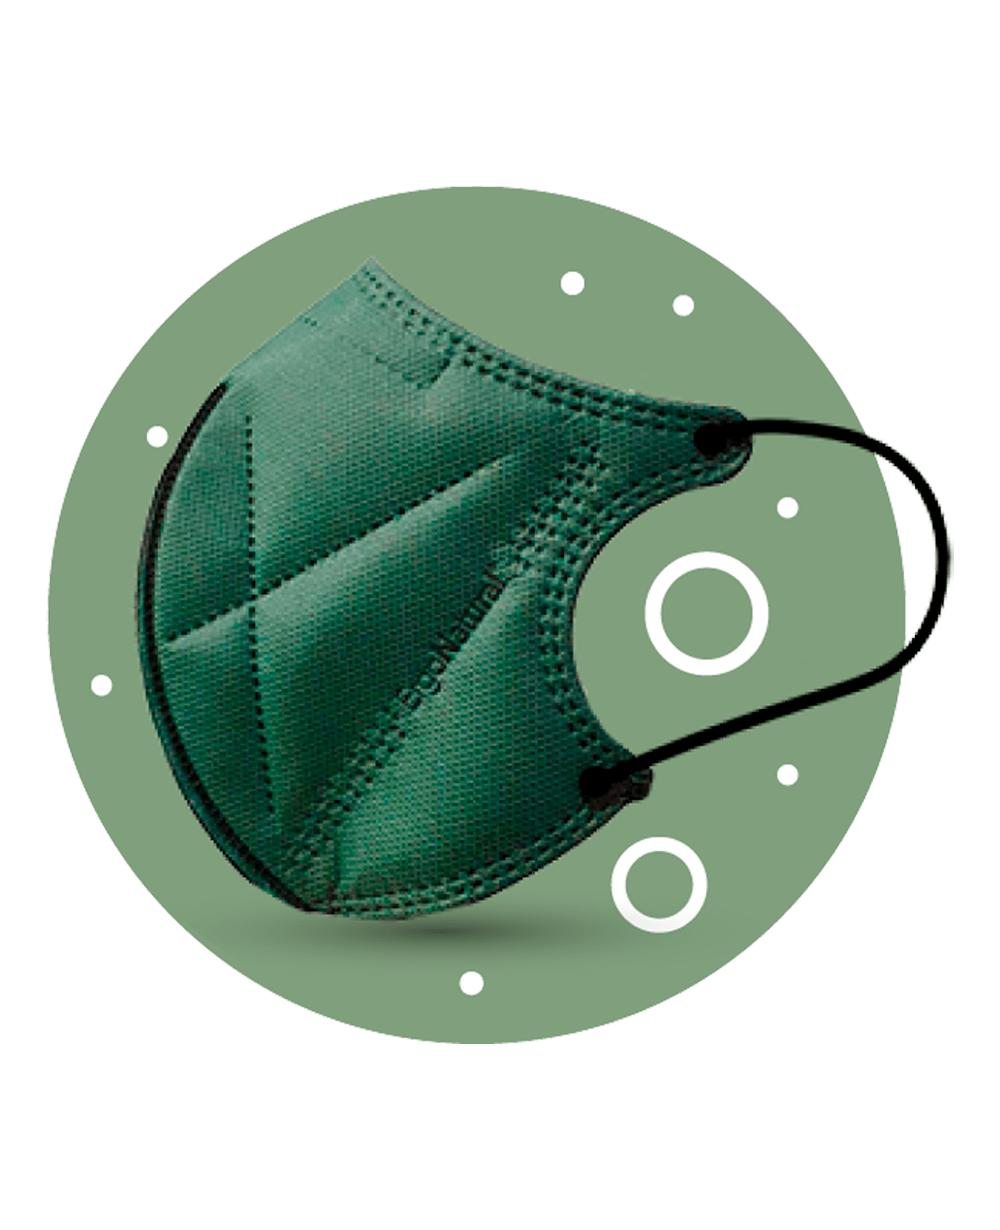 Mascarilla Higiénica Infantil Ergo Natural Reutilizable Pack 2 unidades Tu Cruz Verde Color Verde